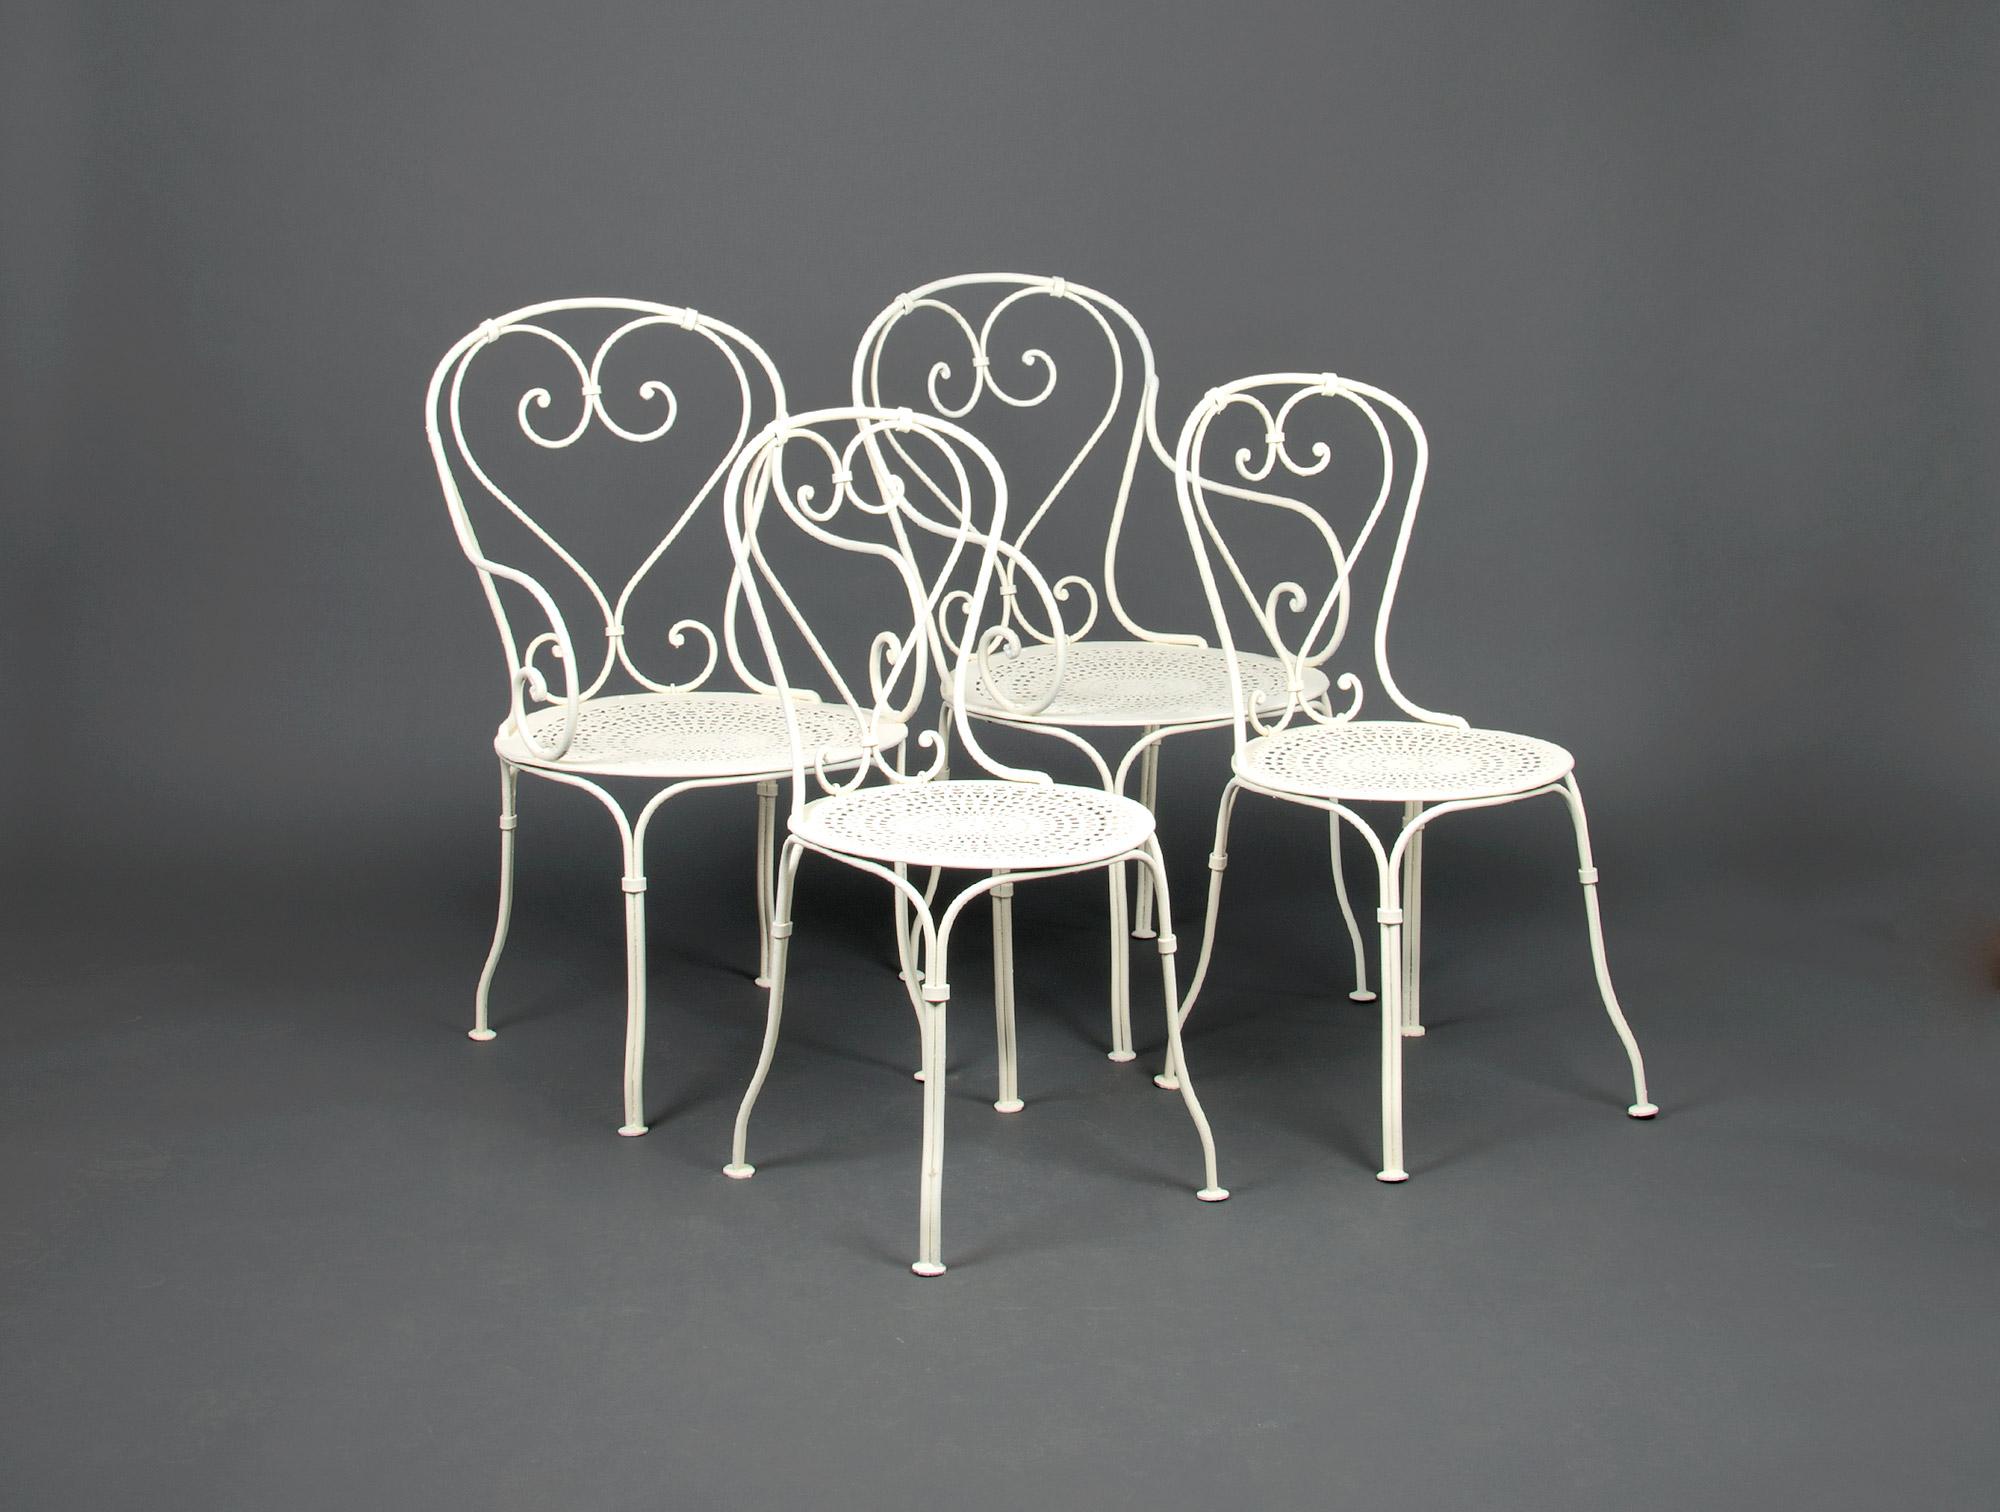 salon de jardin en fer forg blanc soubrier louer si ges salon xxe. Black Bedroom Furniture Sets. Home Design Ideas